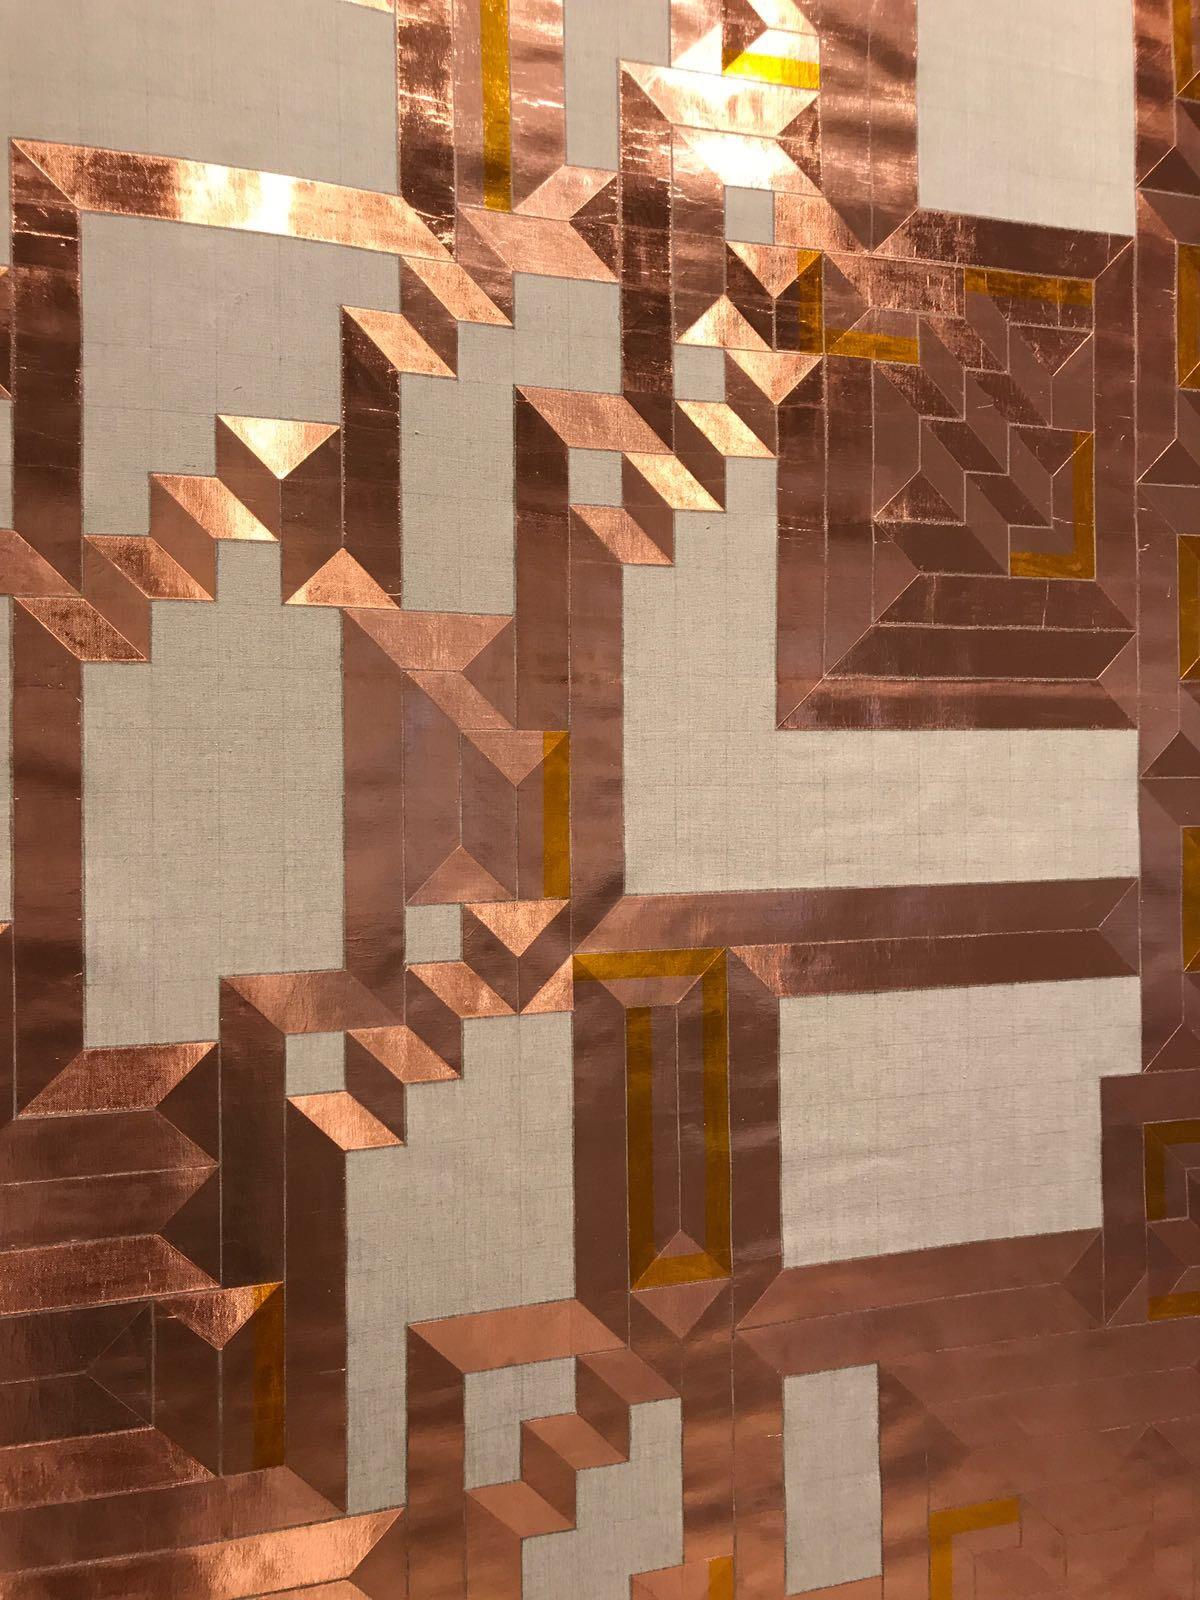 'A Labyrinth of a straight line', (Detail) 2017   Troika (Conny Freyer, Eva Rucki, Sebastien Noel)